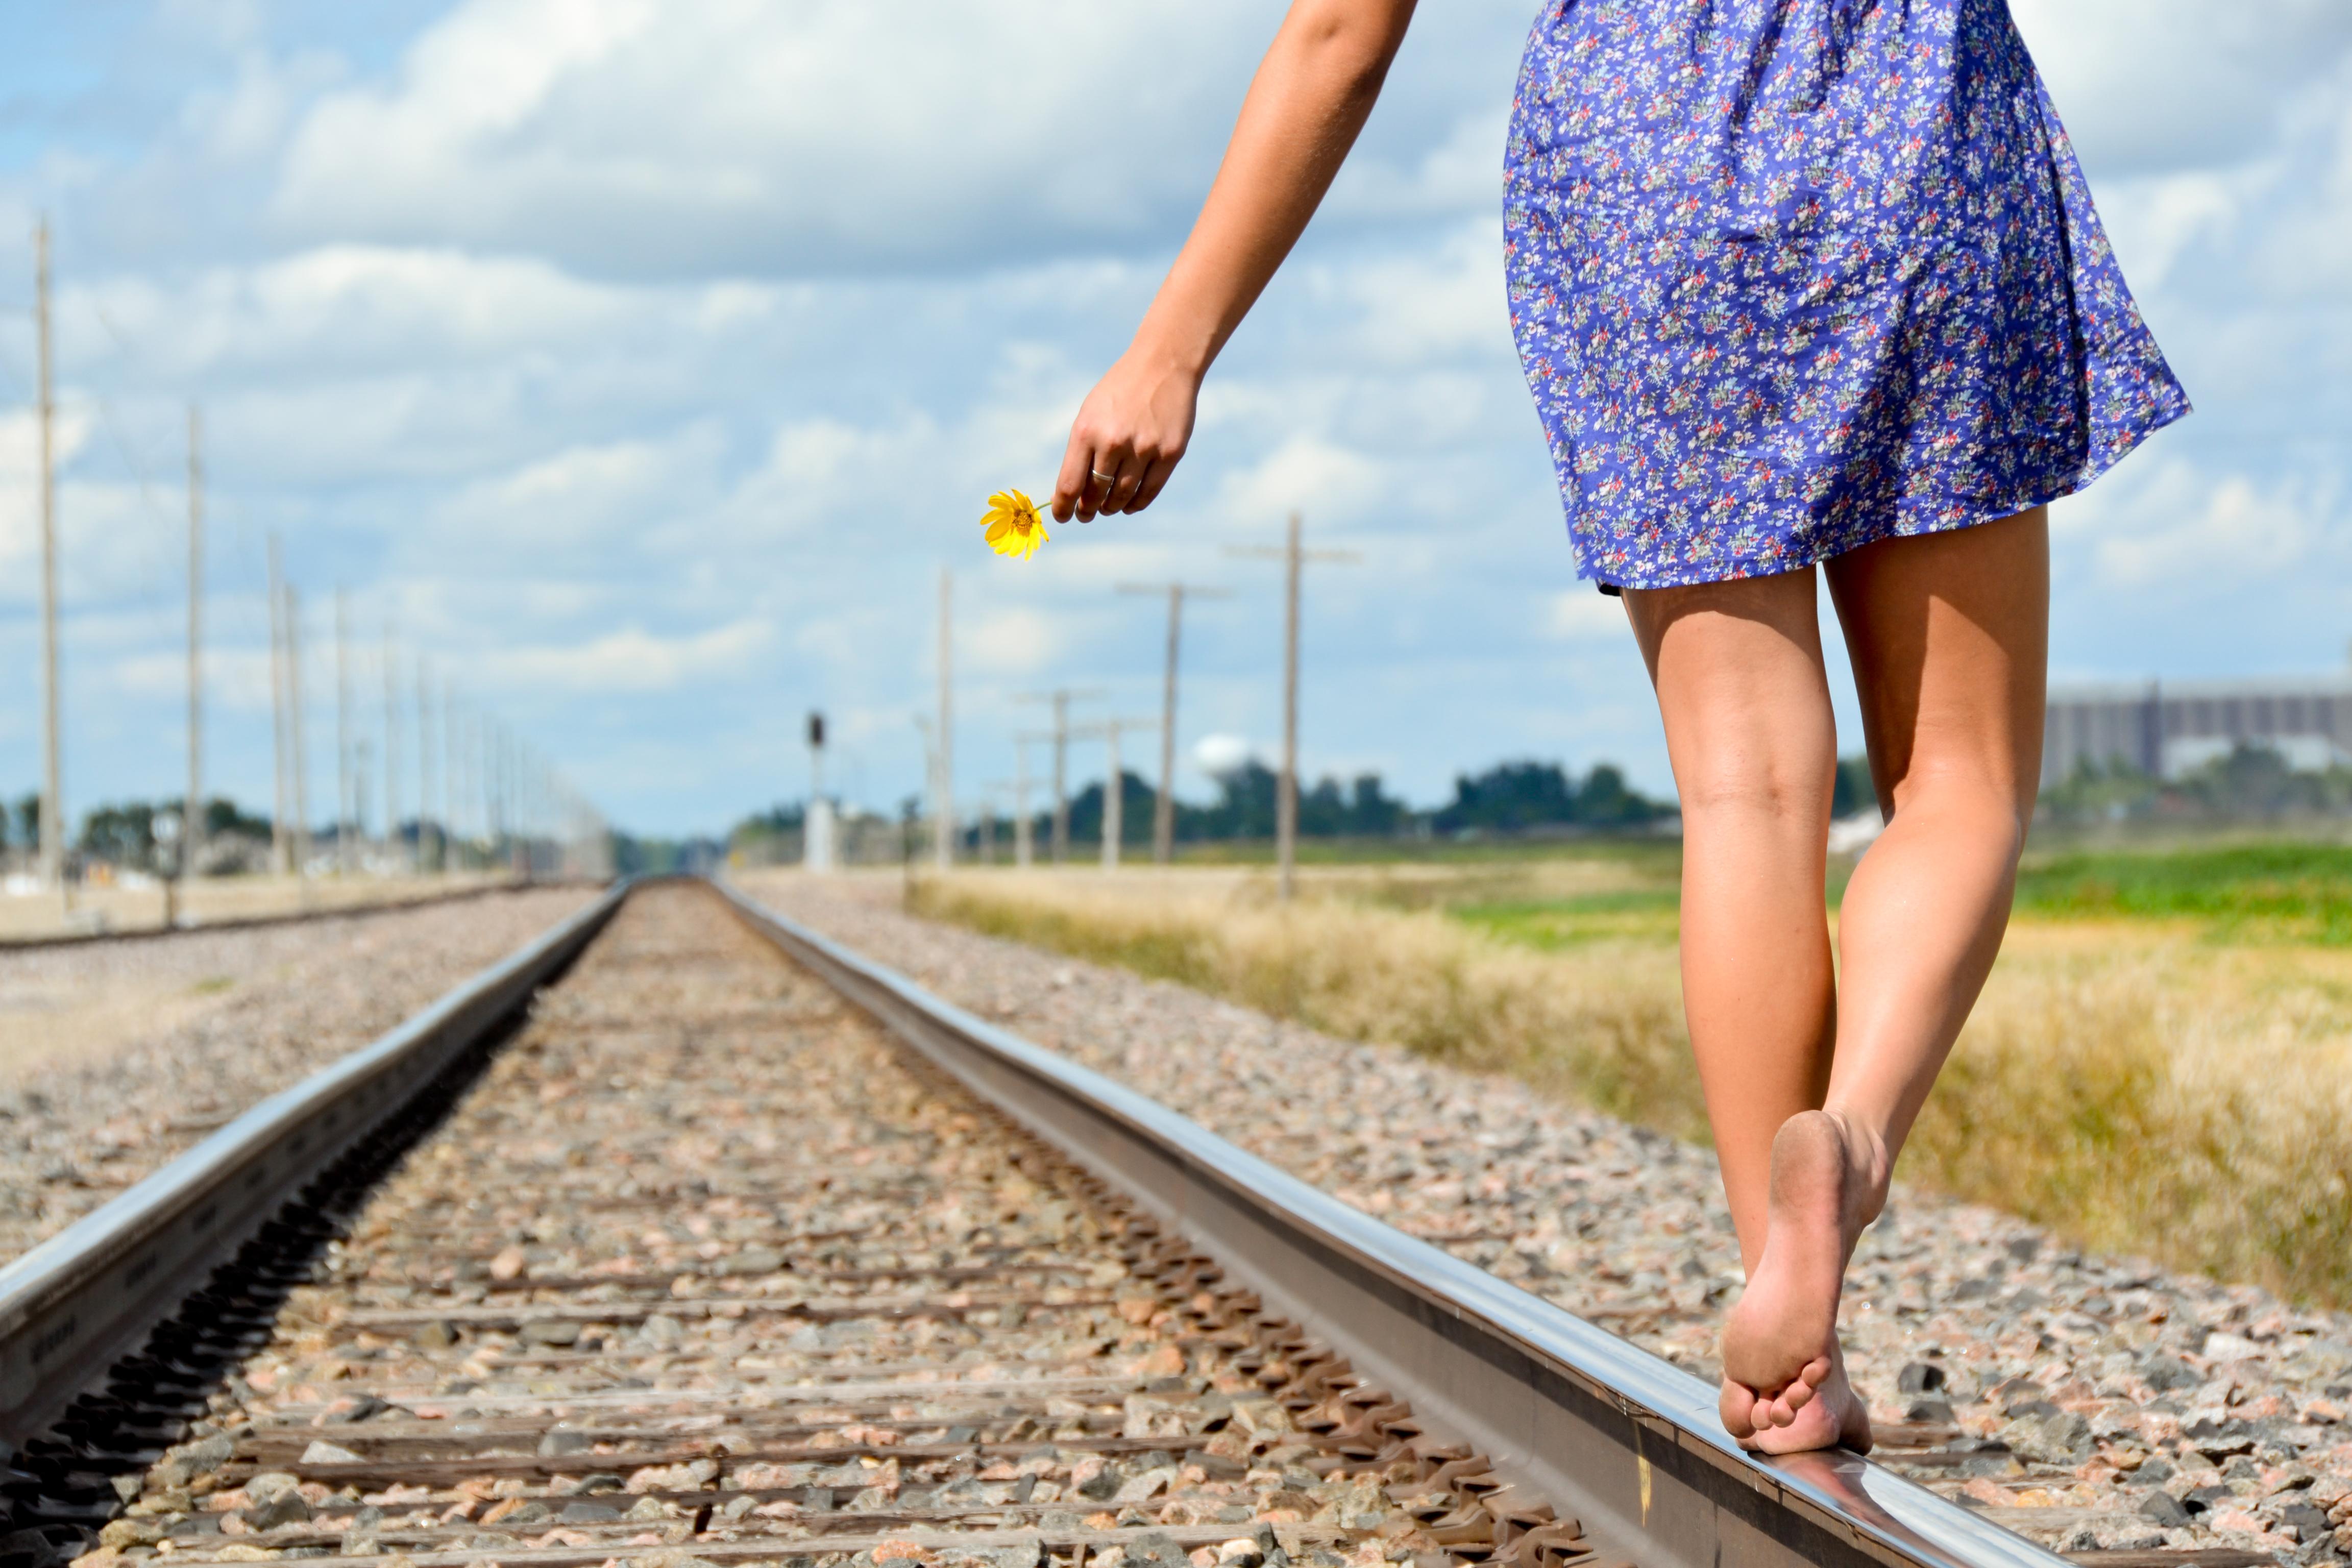 https://get.wallhere.com/photo/summer-Sun-flower-senior-train-Nikon-dress-angle-traintracks-tracks-bluesky-yellowflower-barefoot-runaway-seniorpicture-sundress-middleofnowhere-breakfree-fargonorthdakota-moorheadminnesota-nikond3100-1037379.jpg